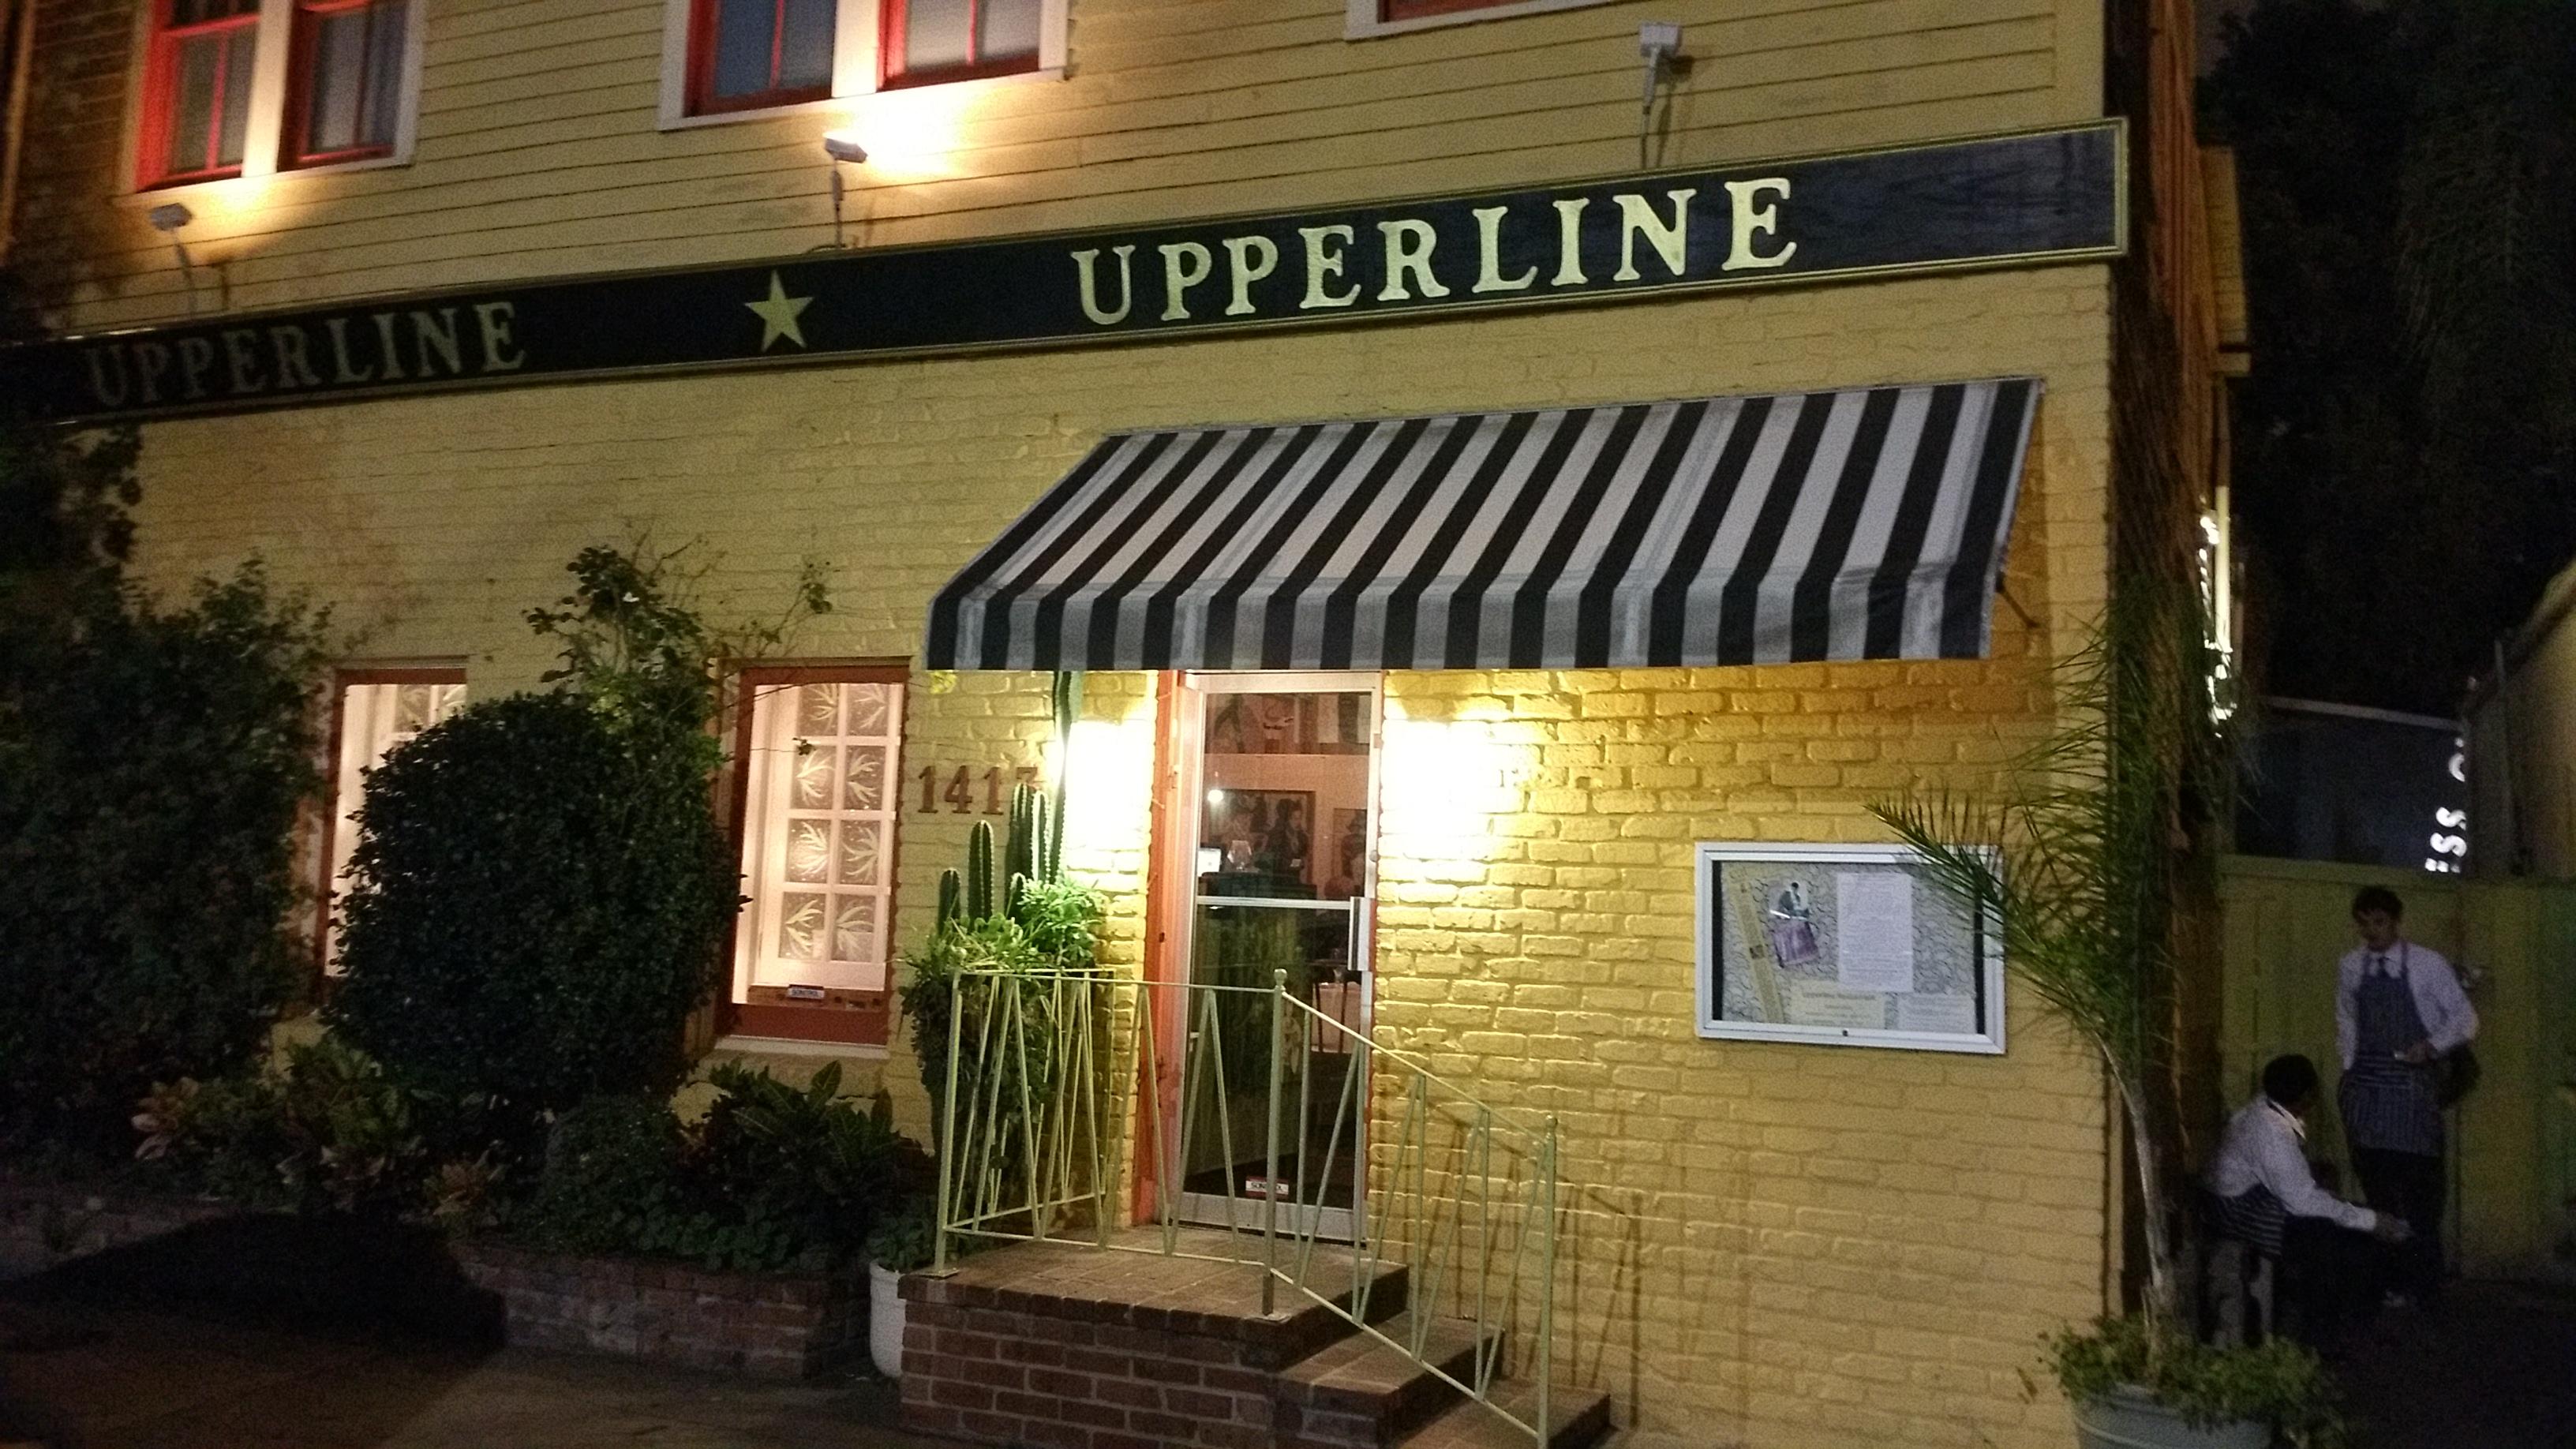 Upperline new orleans restaurant review zagat kristyandbryce Gallery